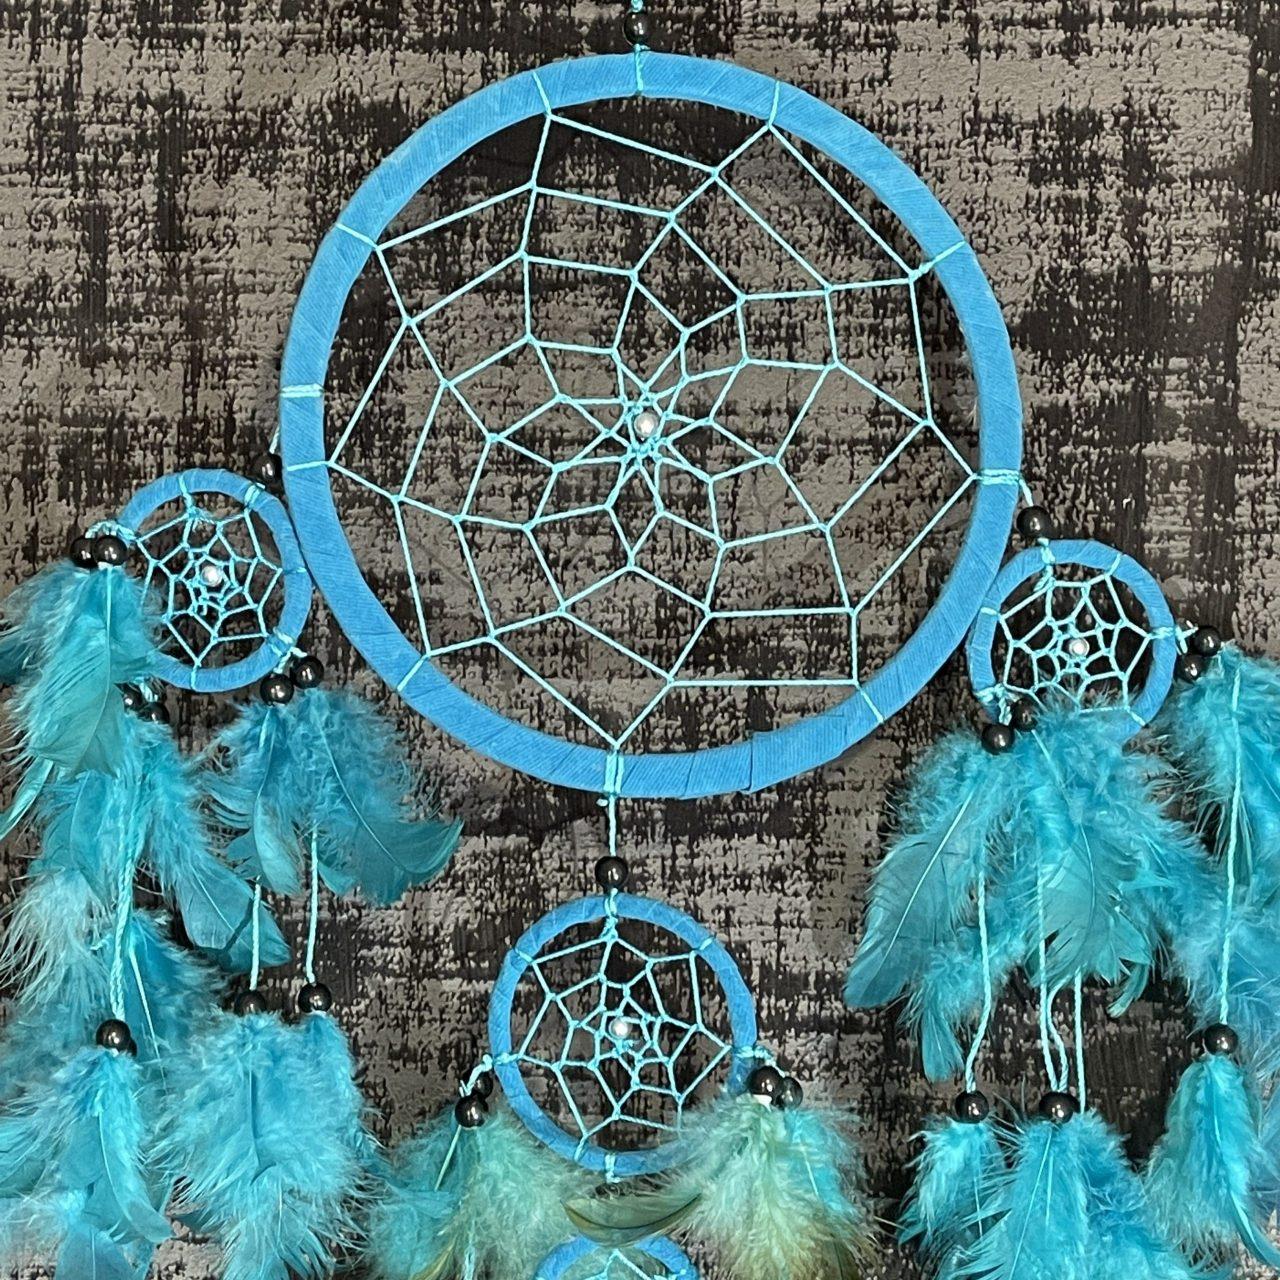 Dreamcatcher RoundBleu 16x45_TRPB-AR_Partiel 1 OK